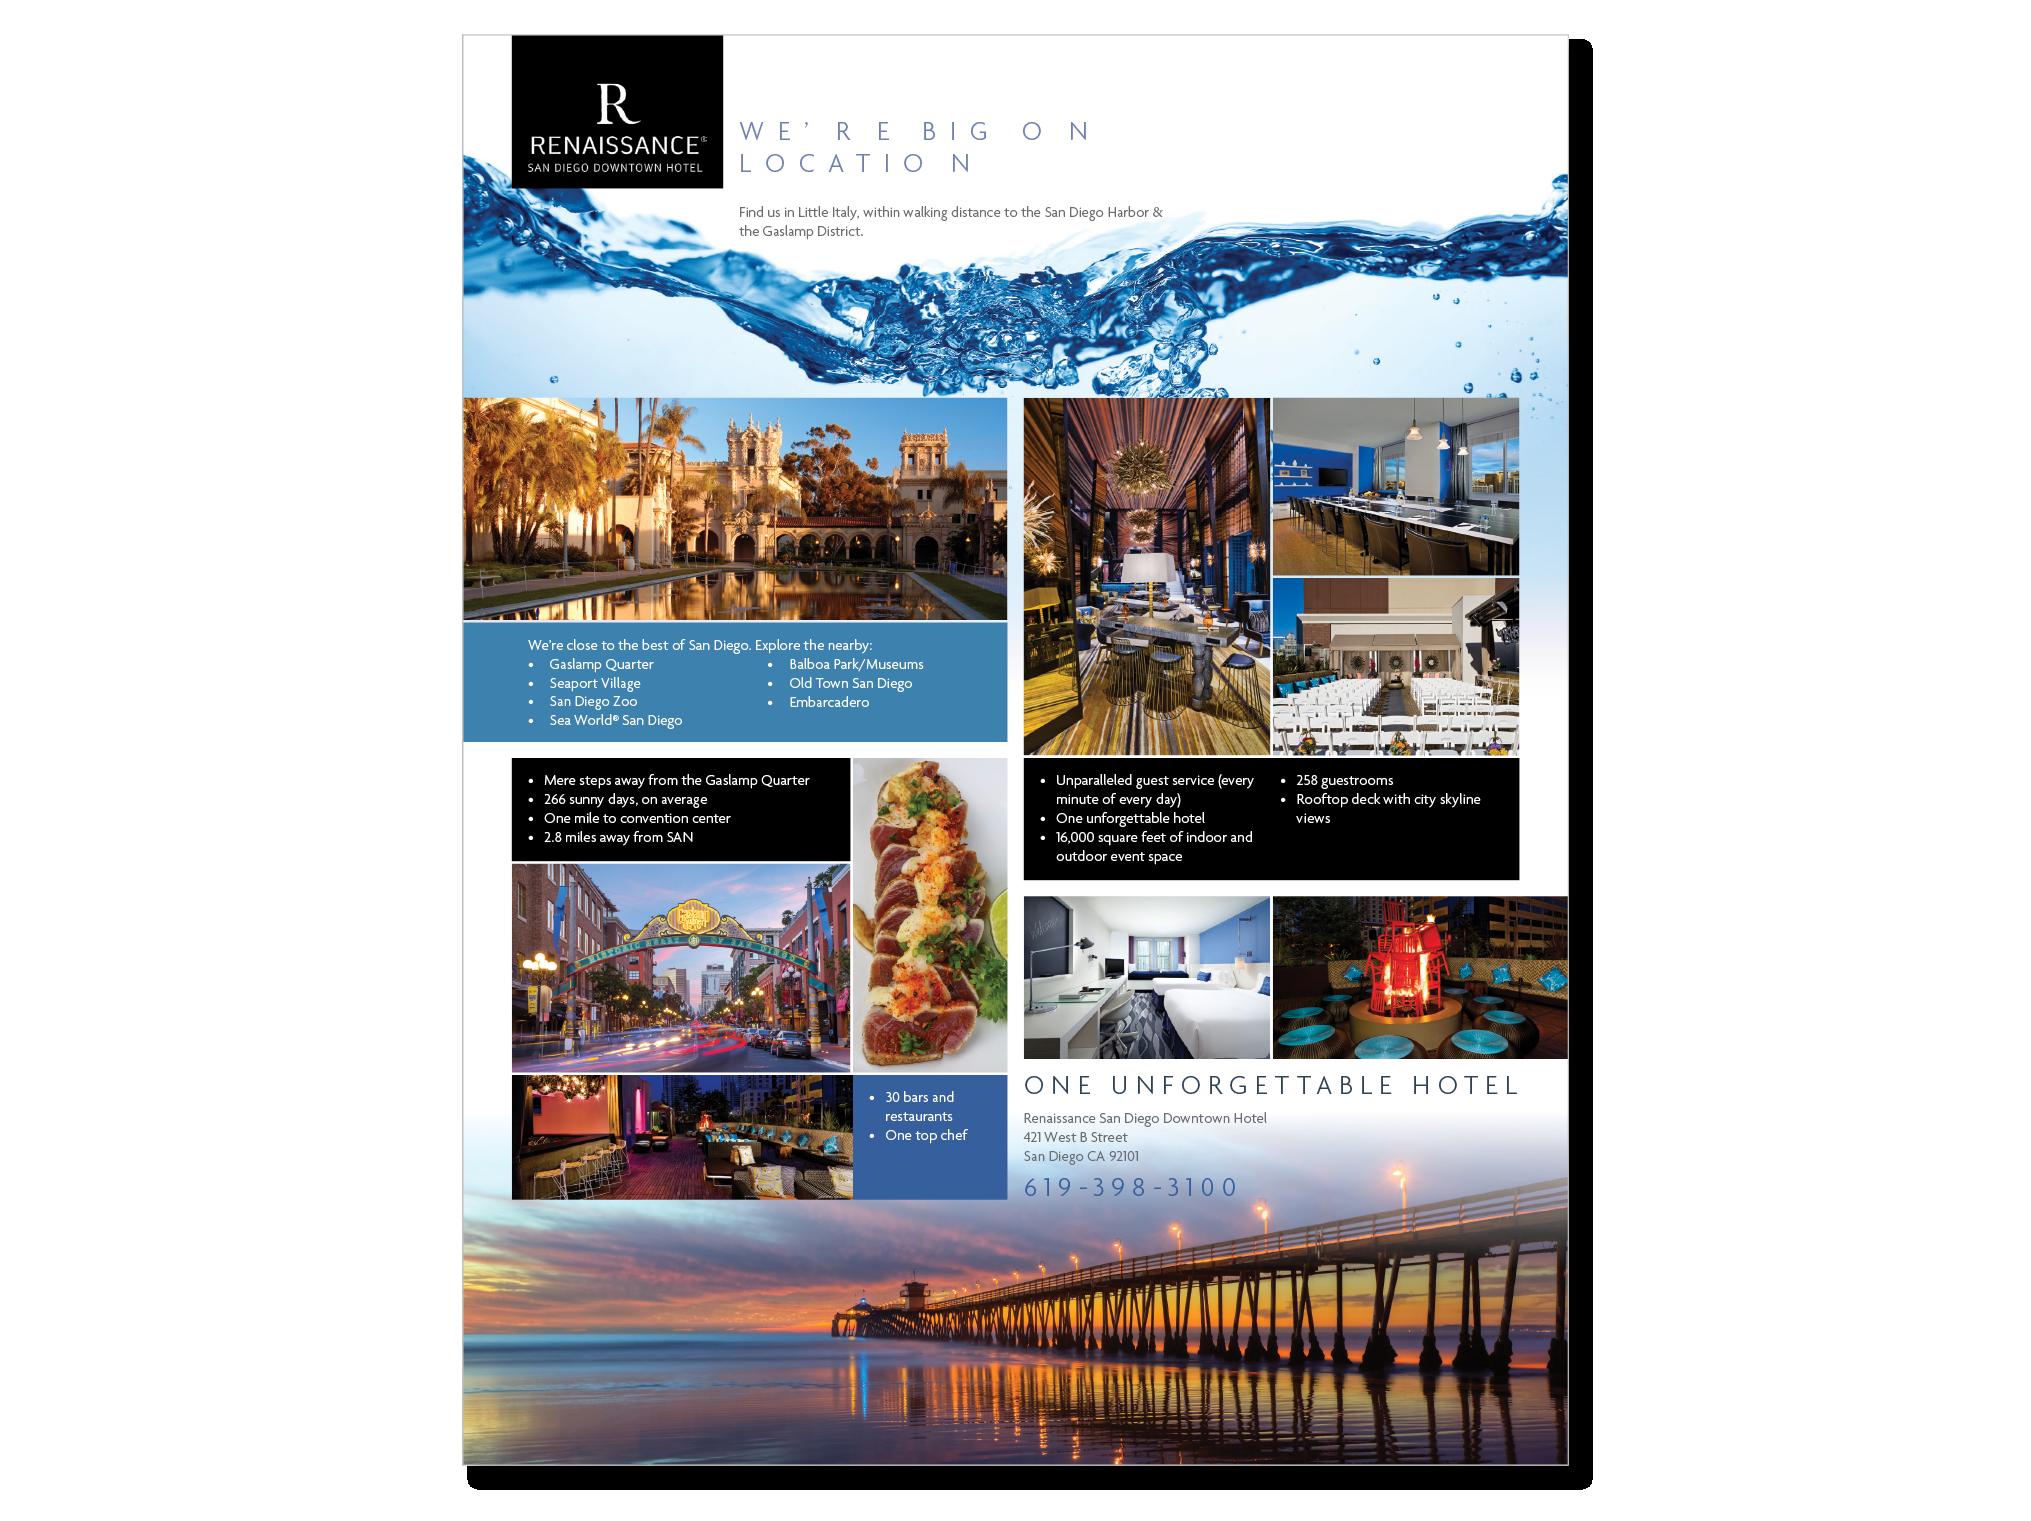 Renaissance Hotel relies on Incite Response Digital Marketing.